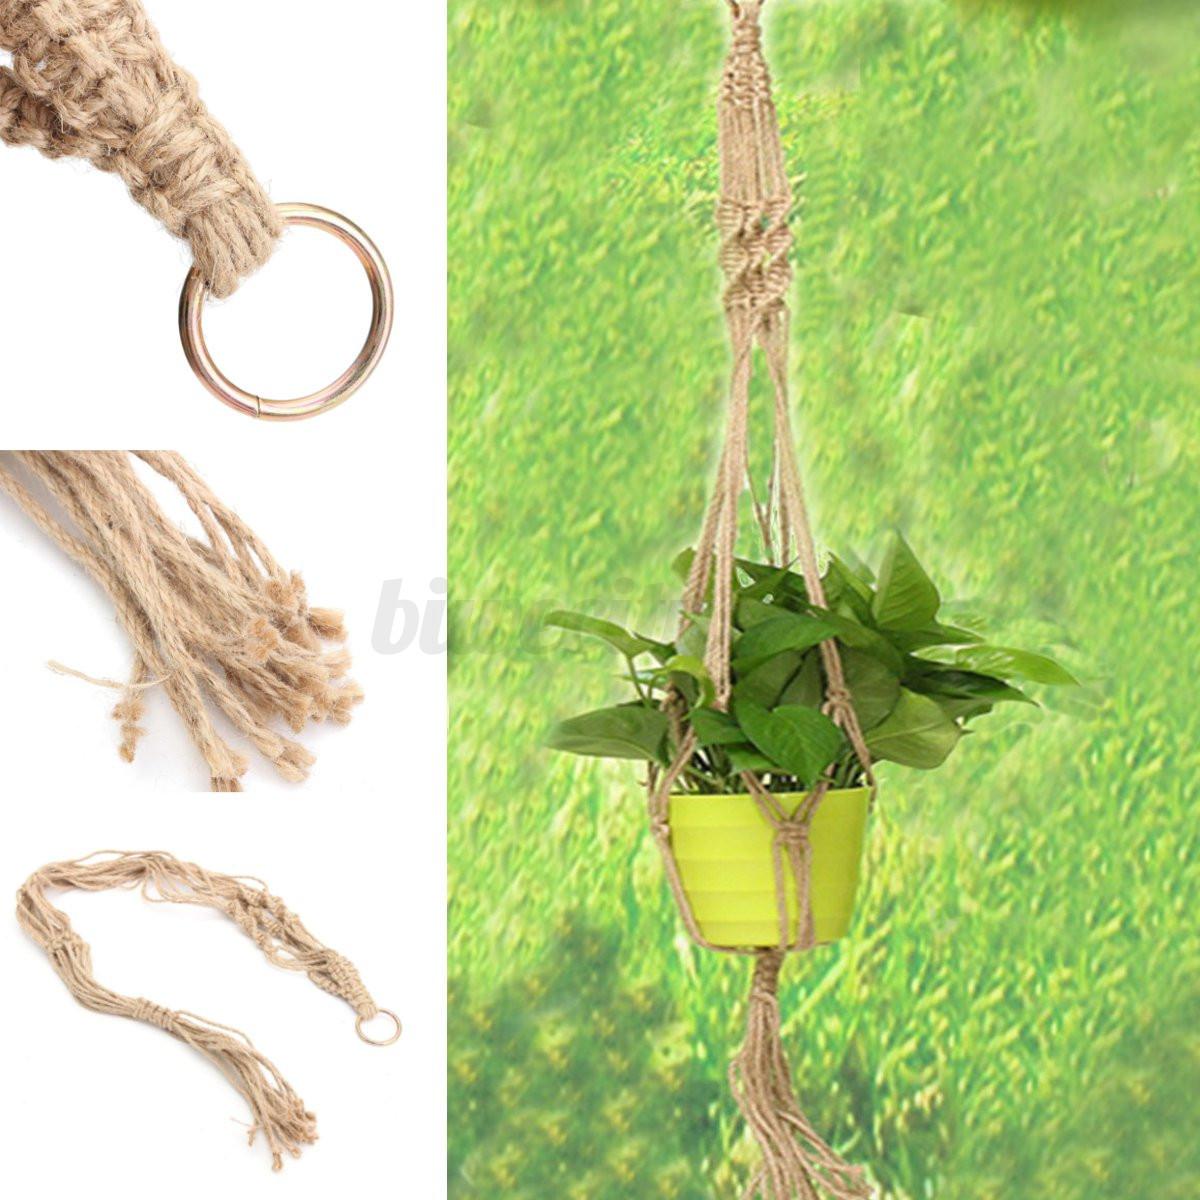 Handmade Jute Baskets : Natural jute macrame cord handmade braided hanging basket